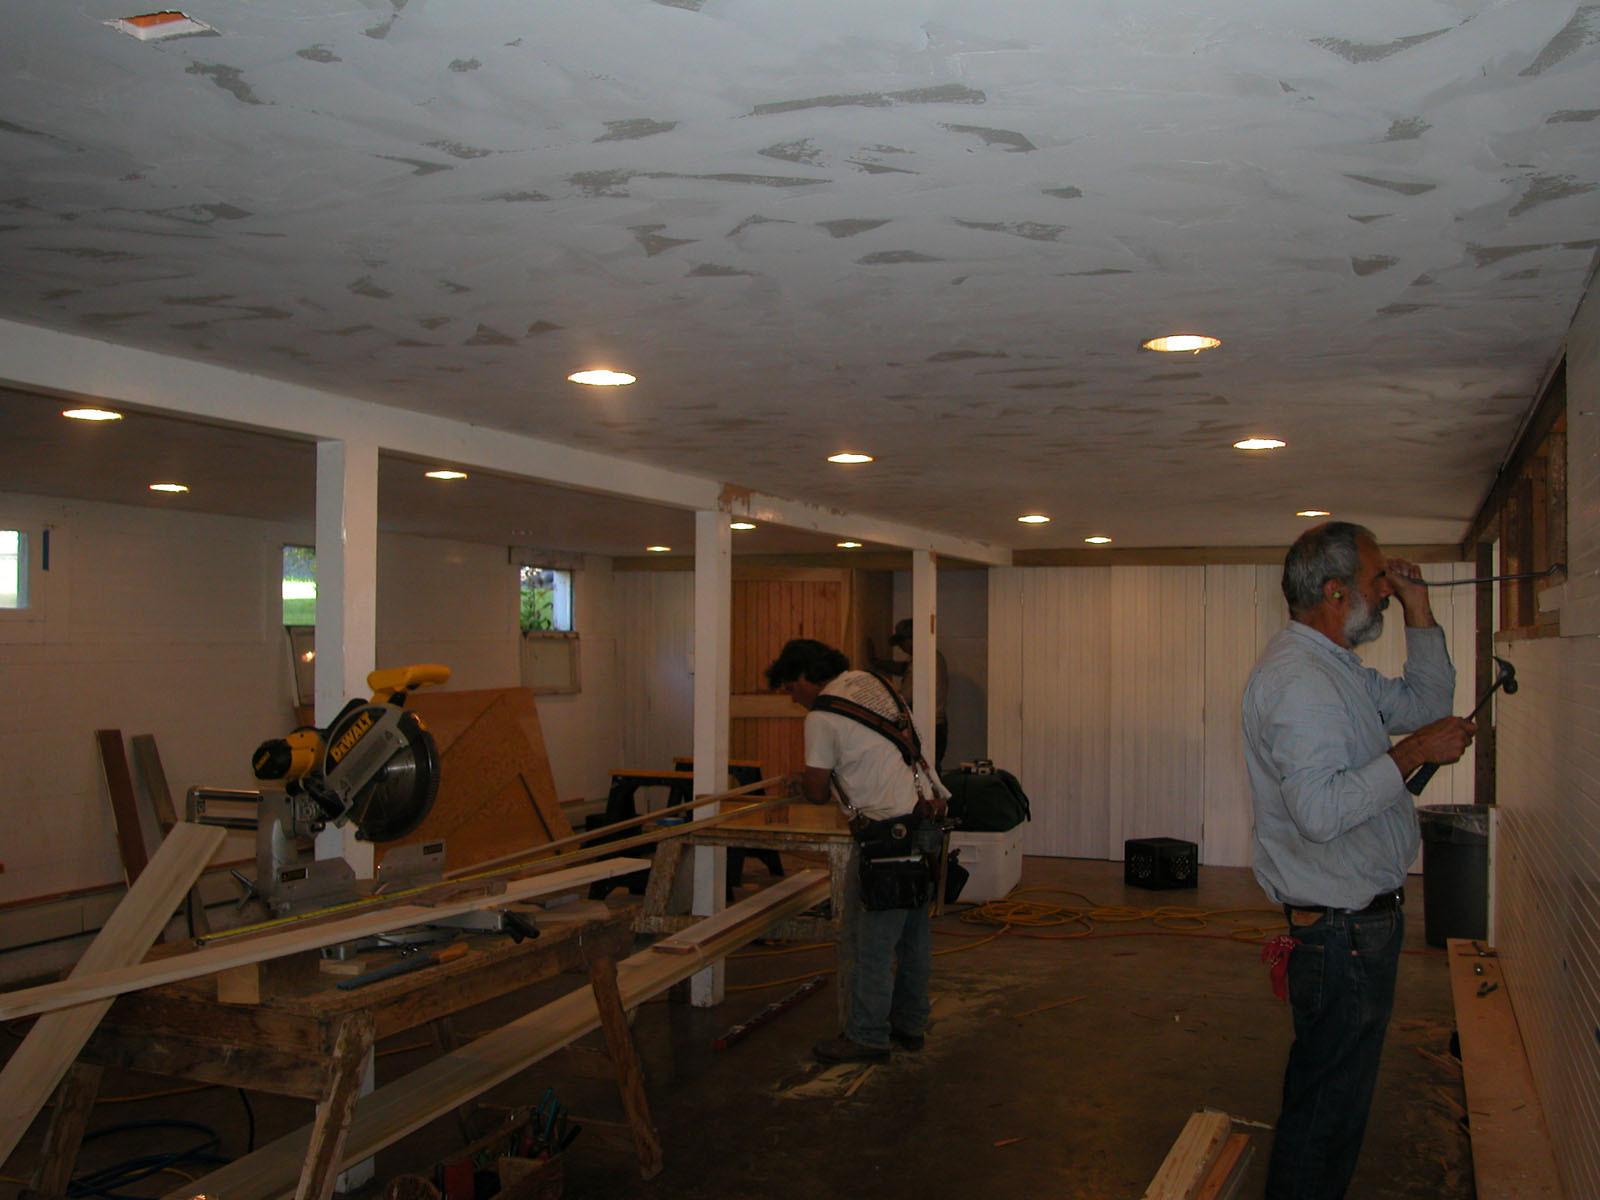 Volunteer construction crew working on a basement upgrade.